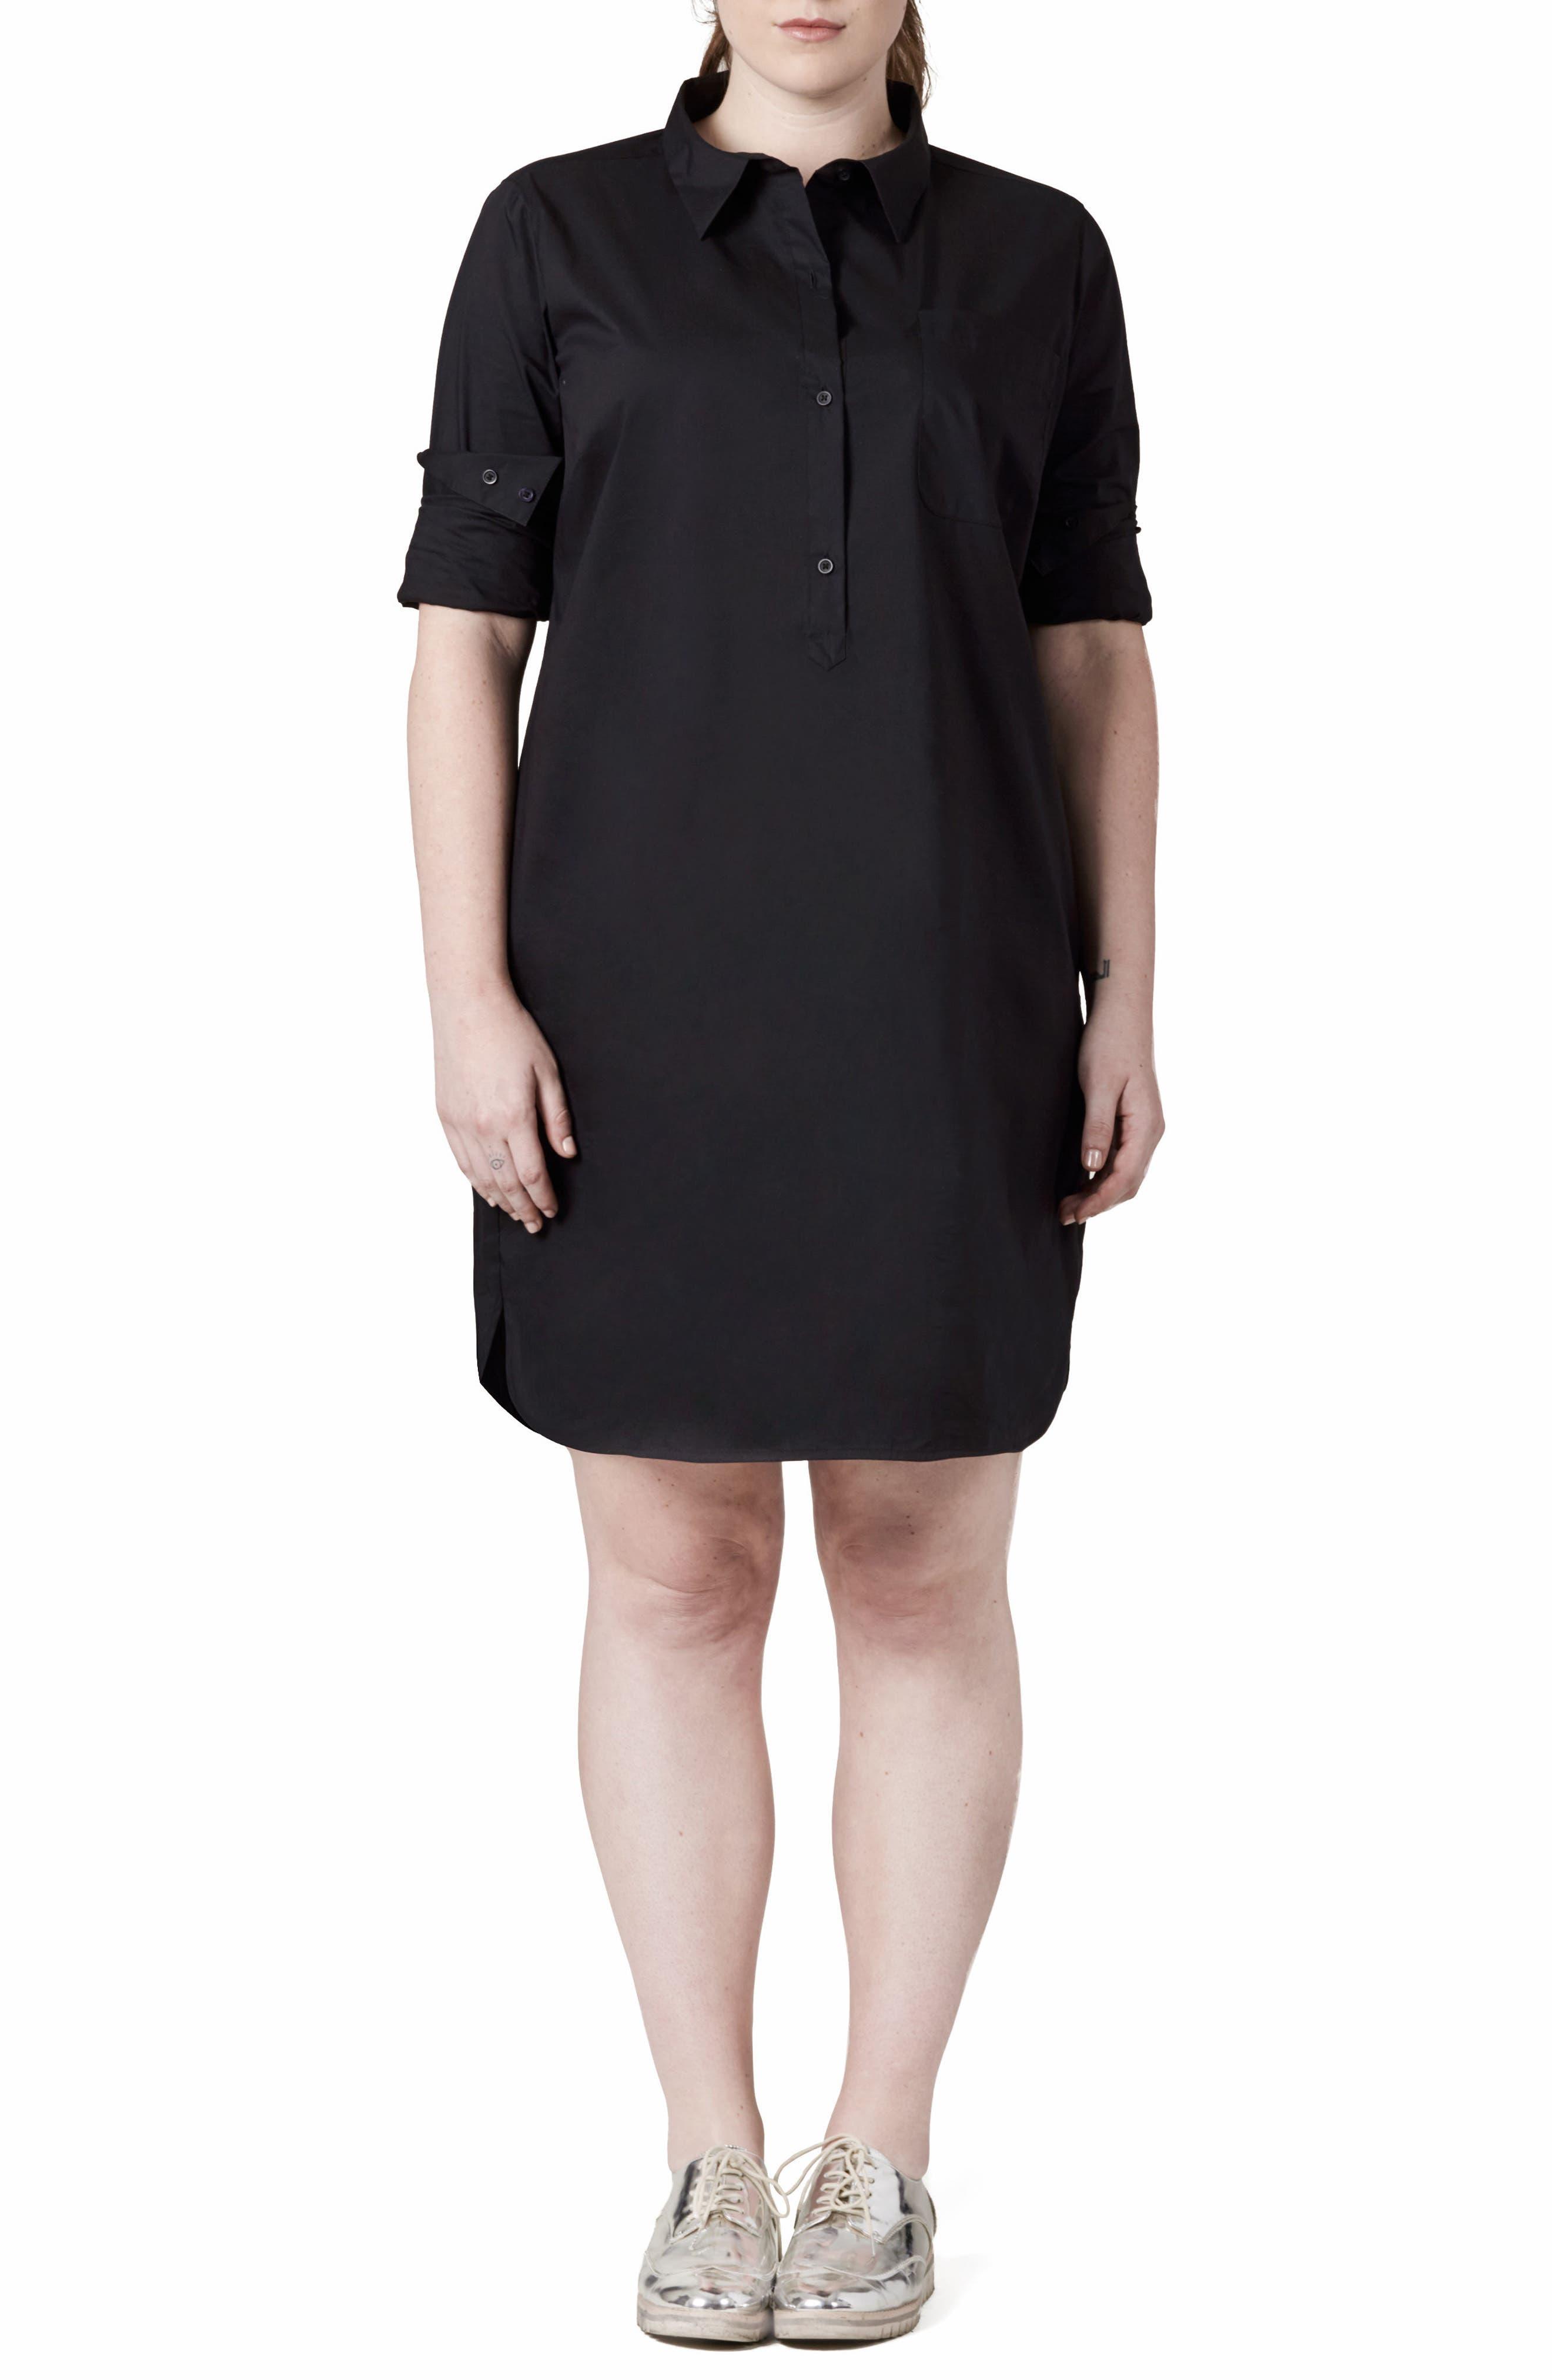 Rubicon Shirtdress,                             Main thumbnail 1, color,                             Black